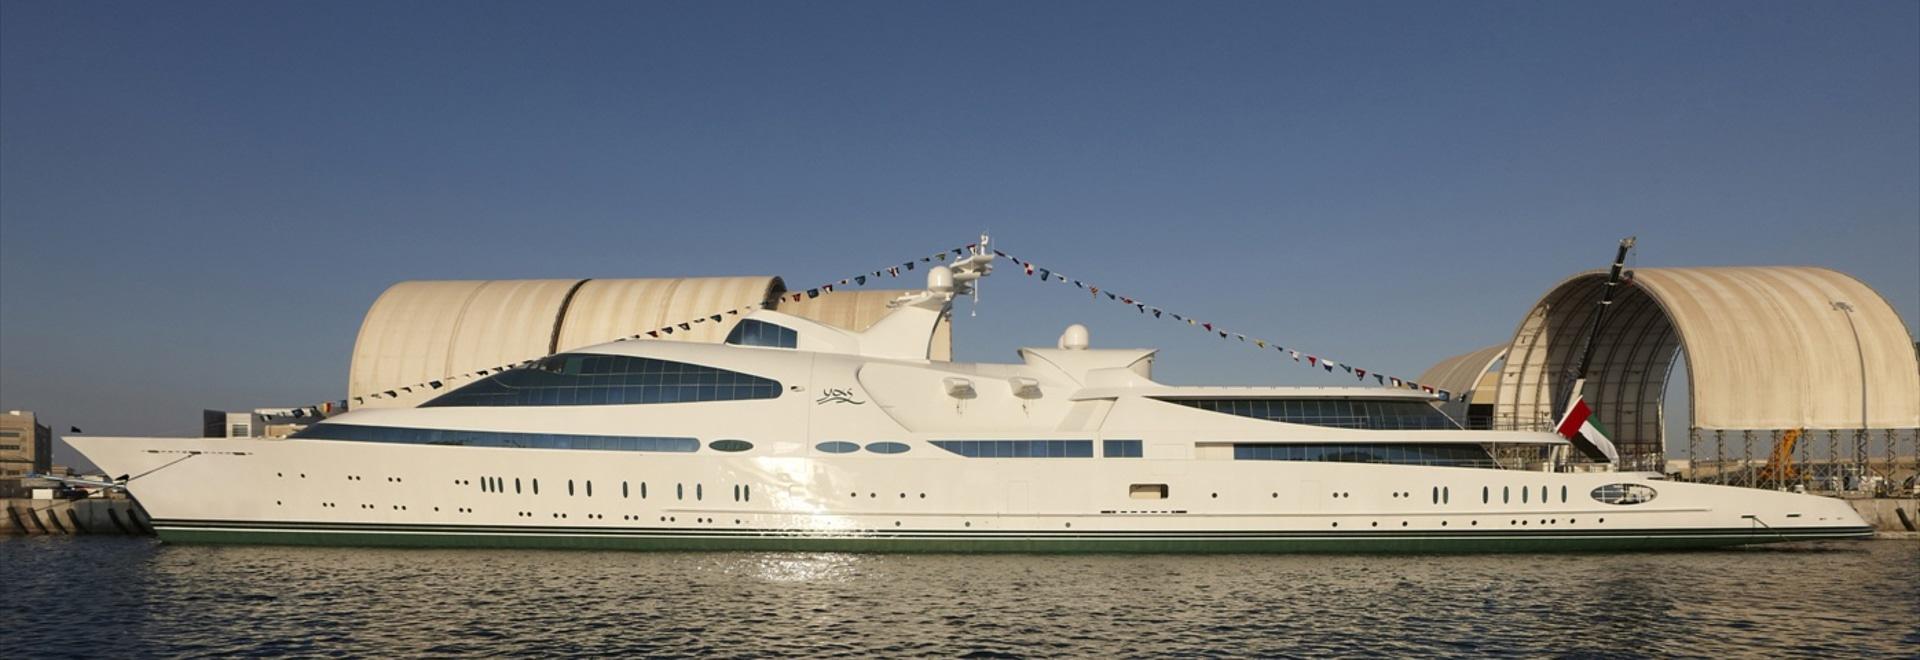 141m mega yacht YAS undergoing sea trials